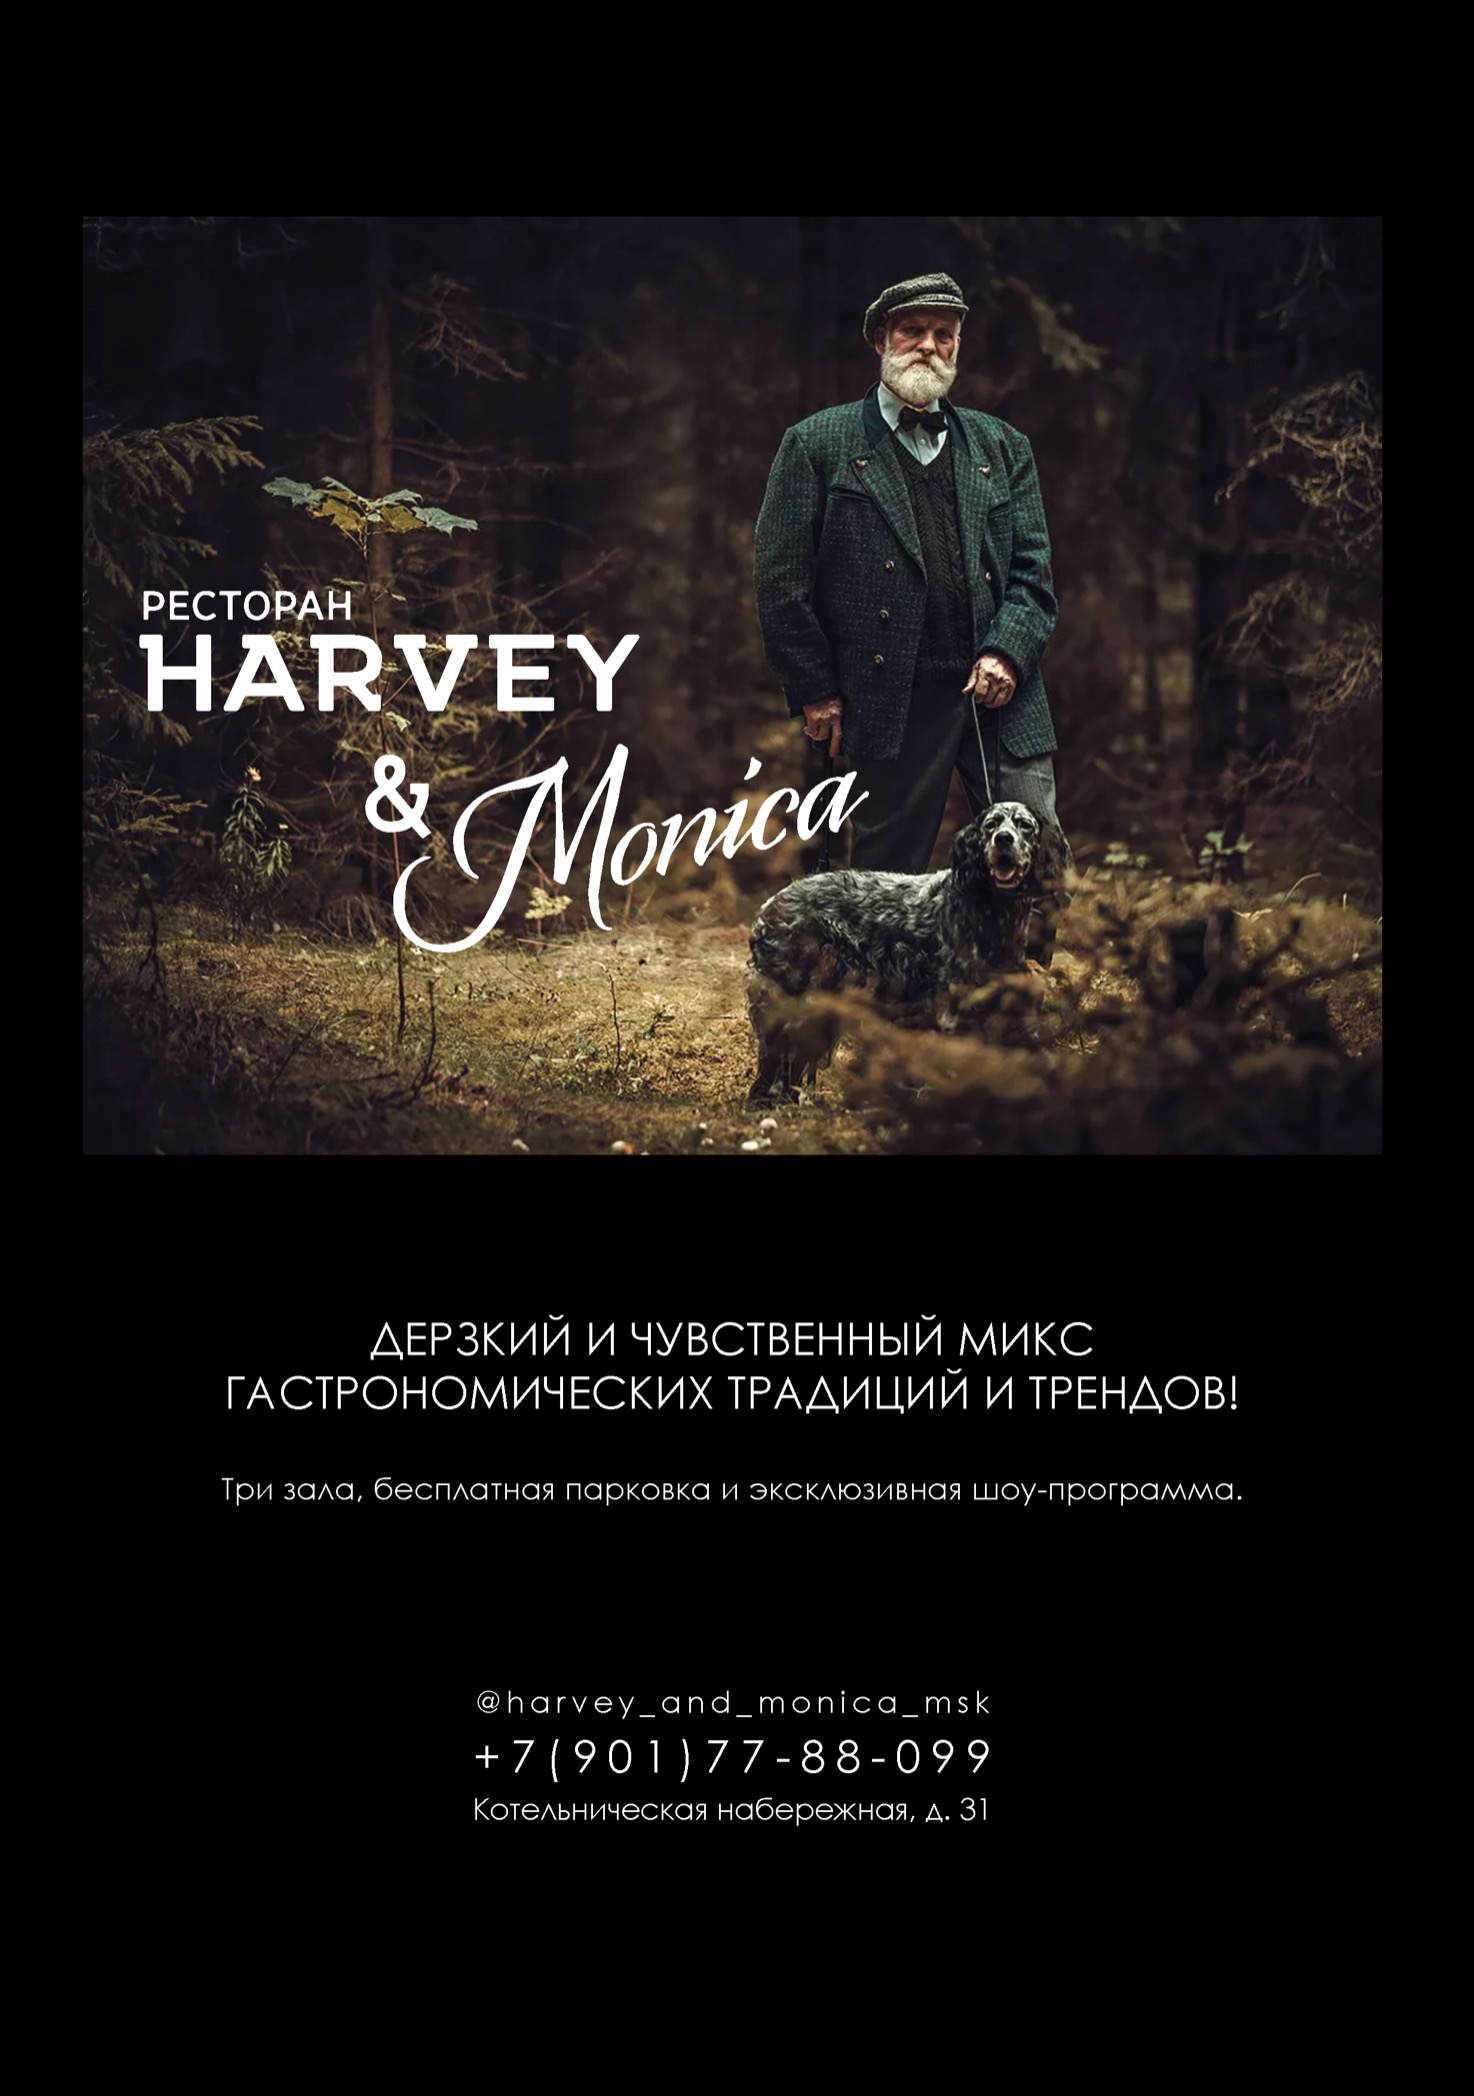 BLOGGMAGAZINE_harvey_and_monika_restoran